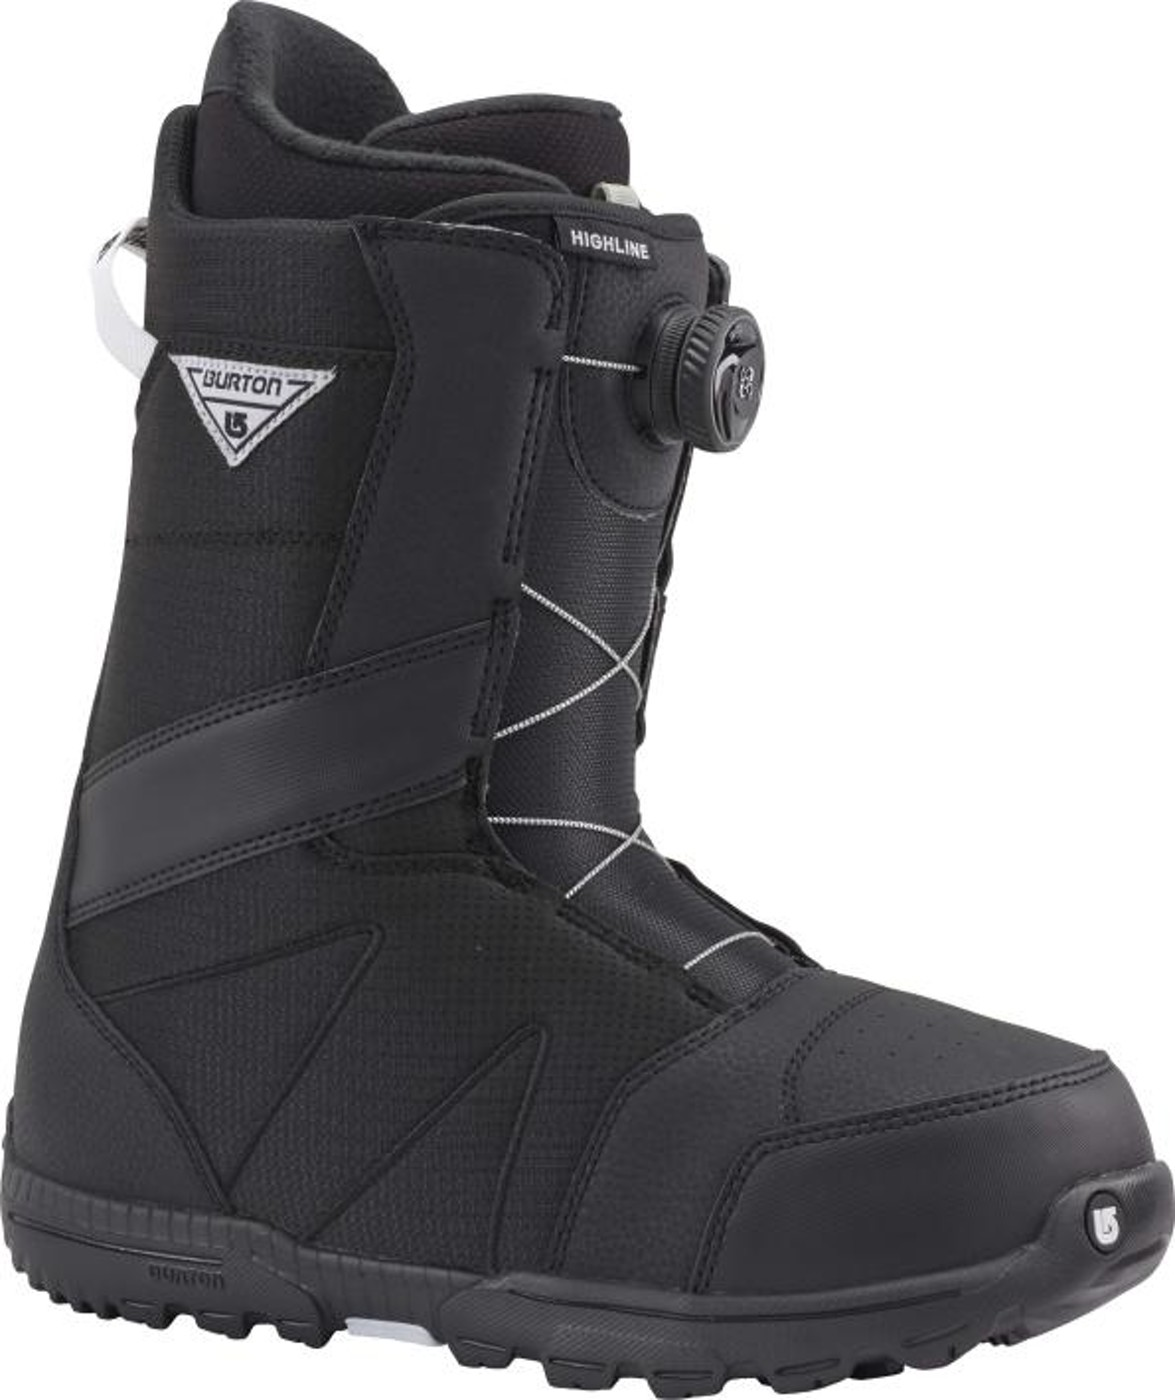 BURTON Snowboard-Boot HIGHLINE BOA - Herren